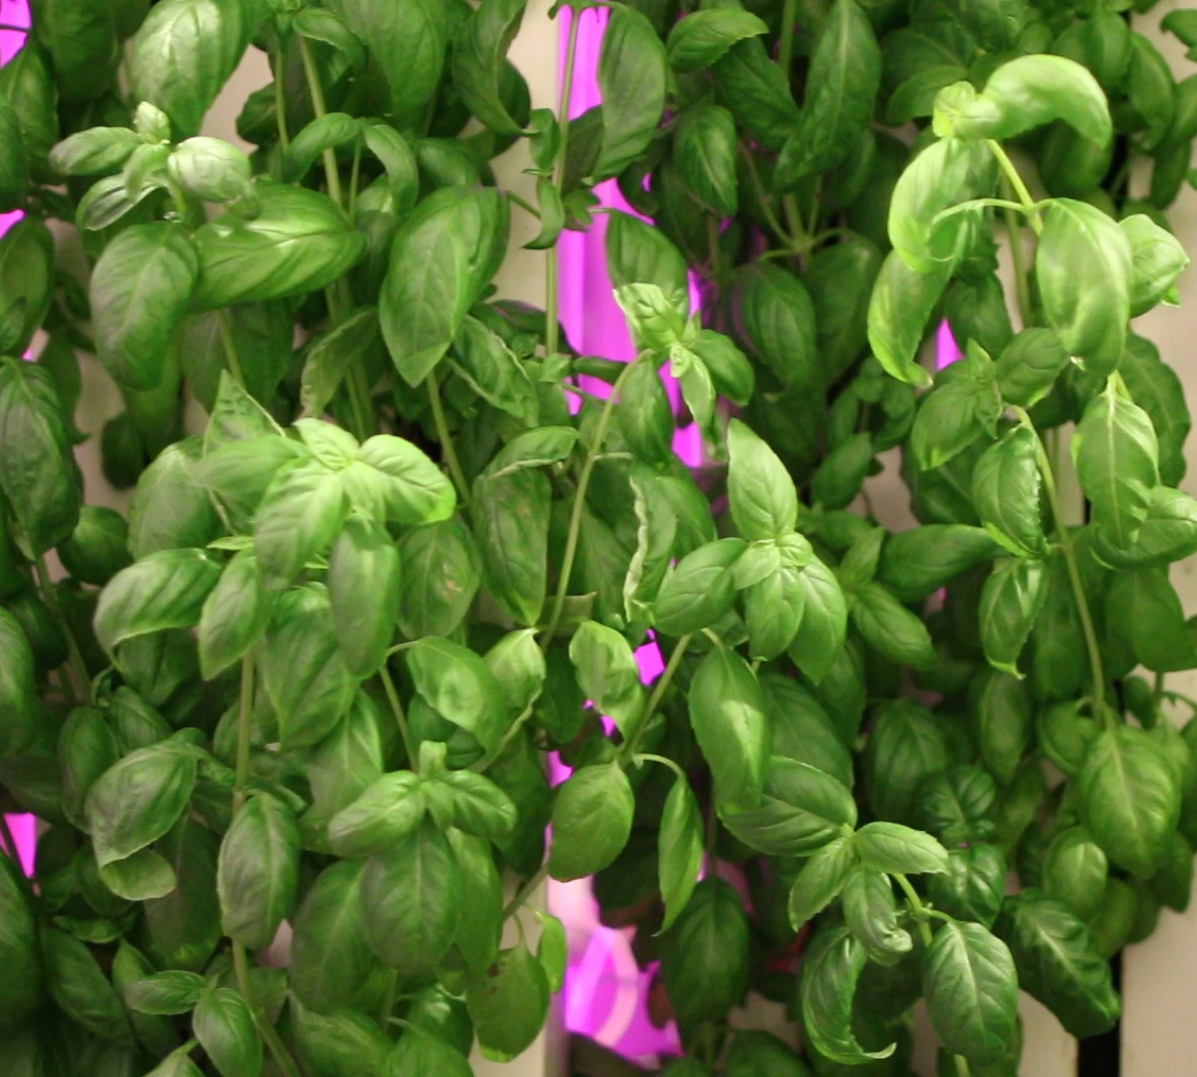 Leafy-Green-Machine-Basil2.jpg